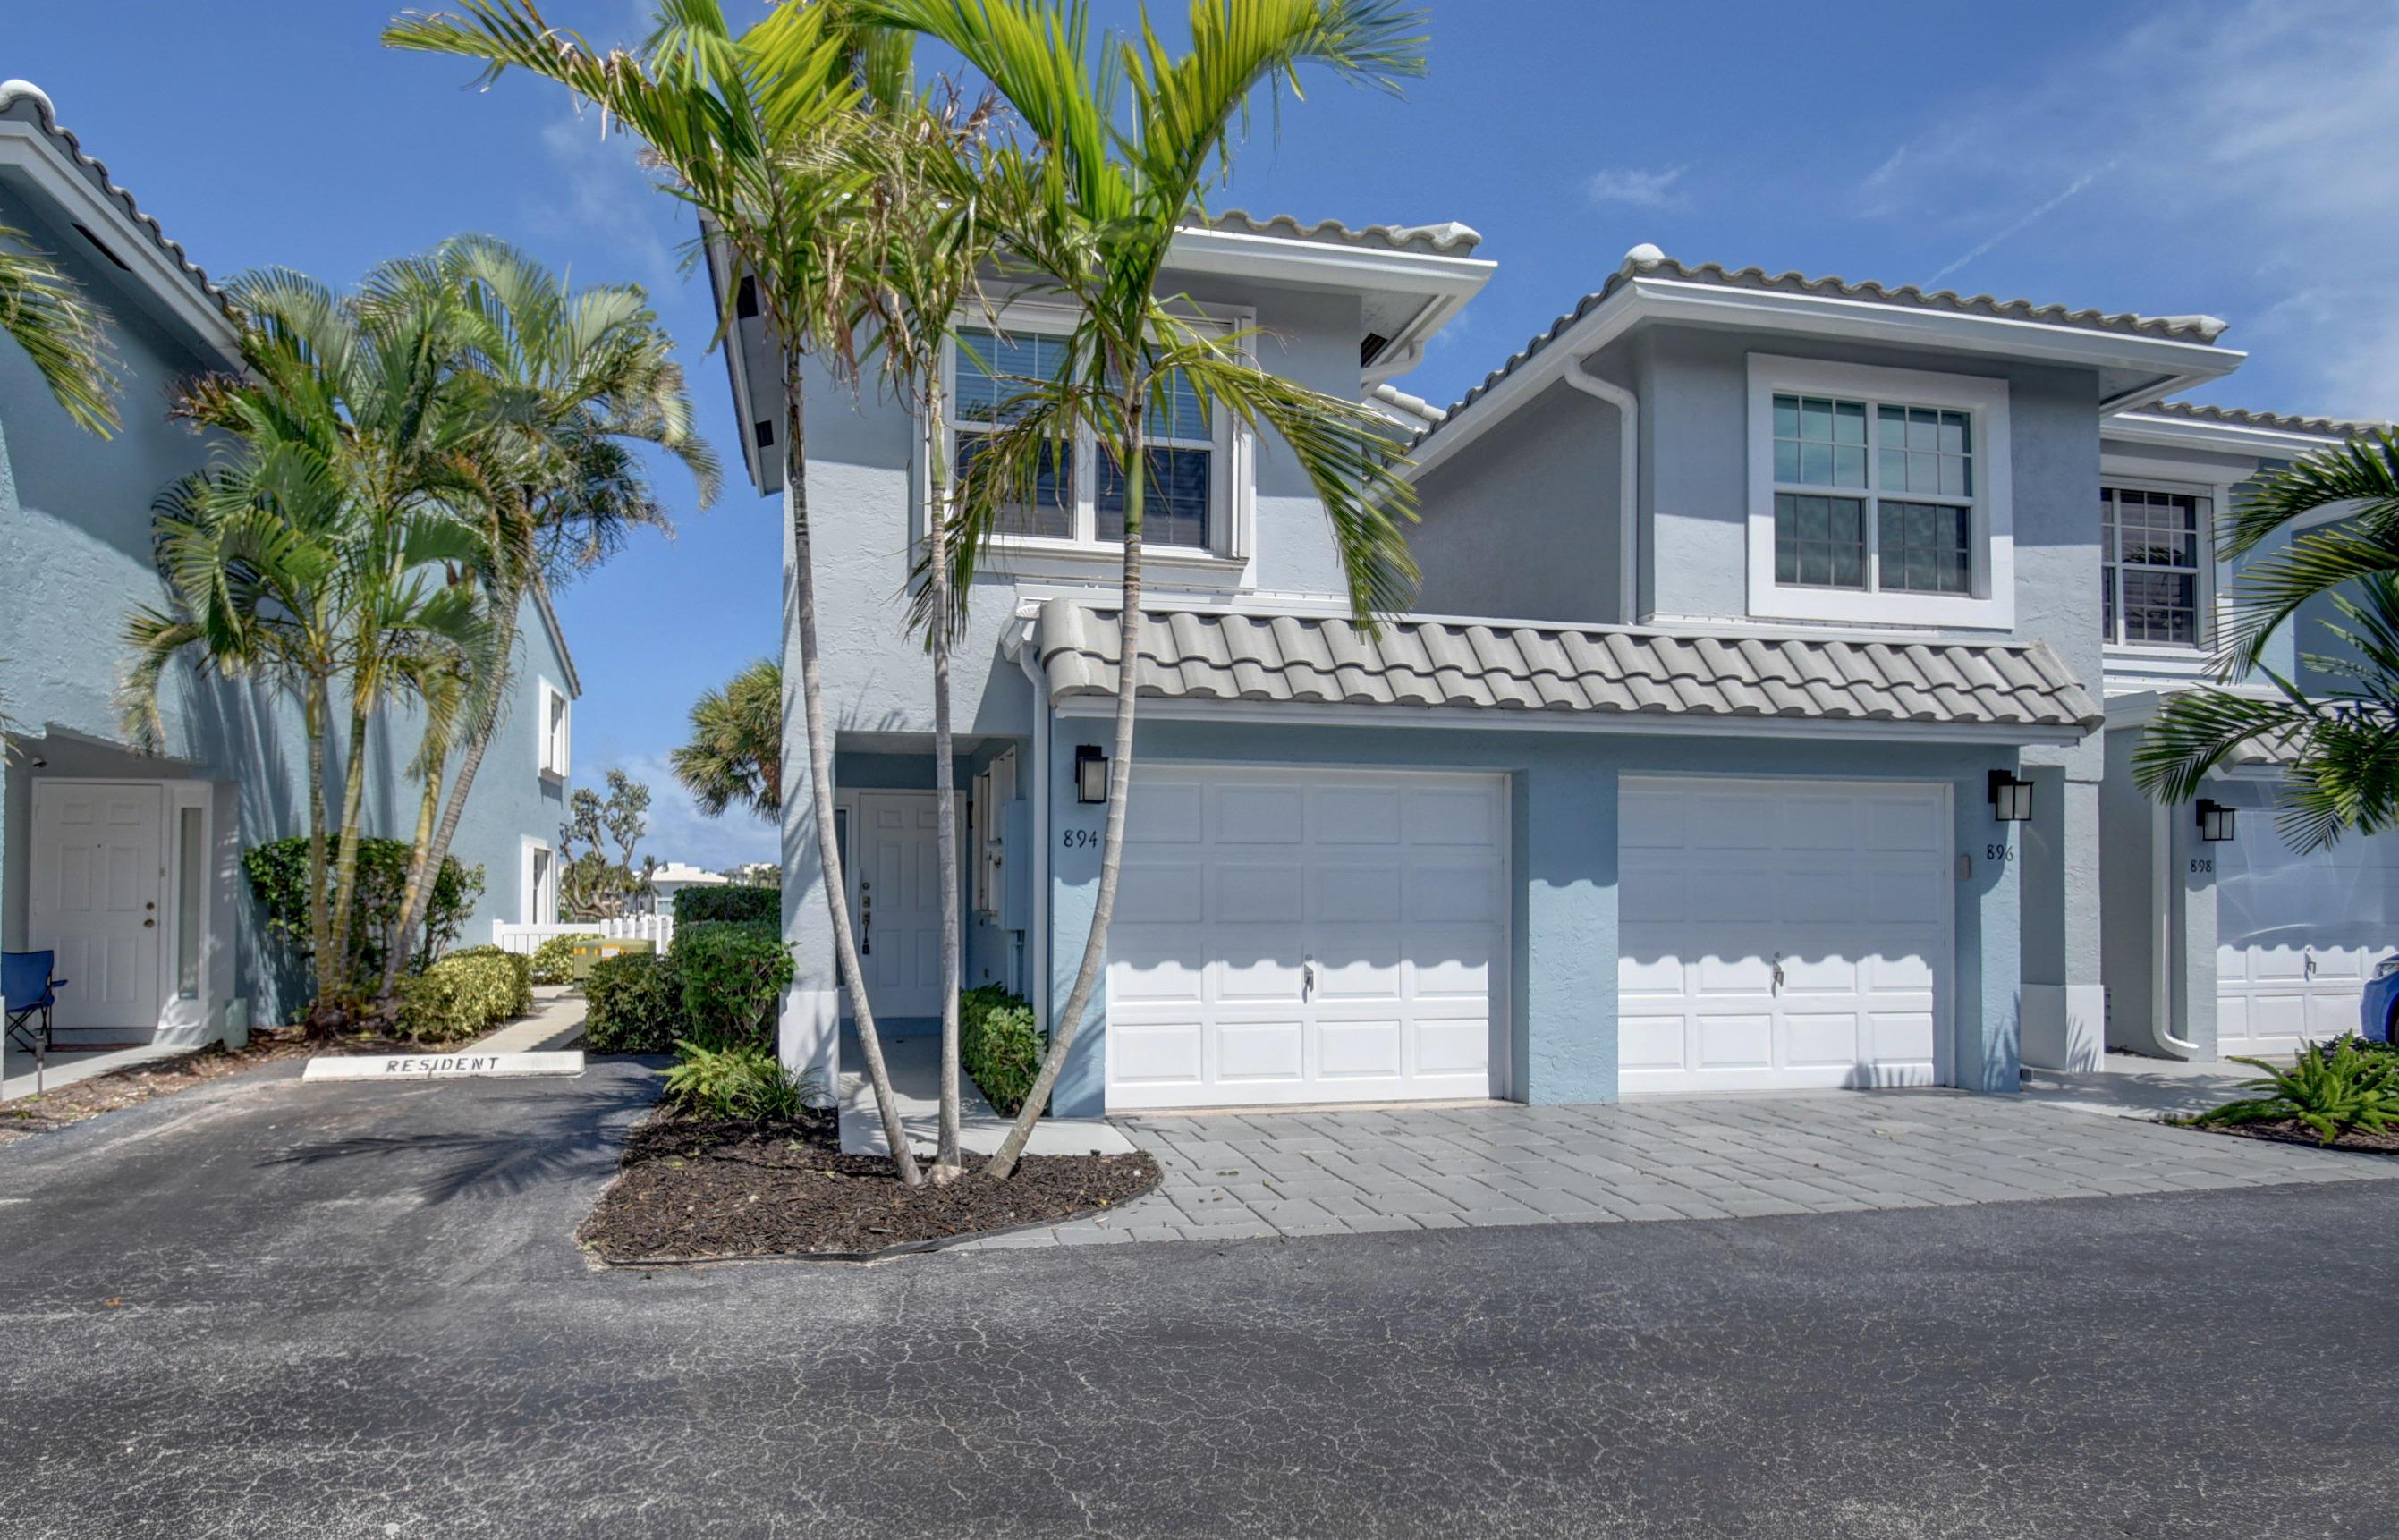 894 Jeffery Street Boca Raton, FL 33487